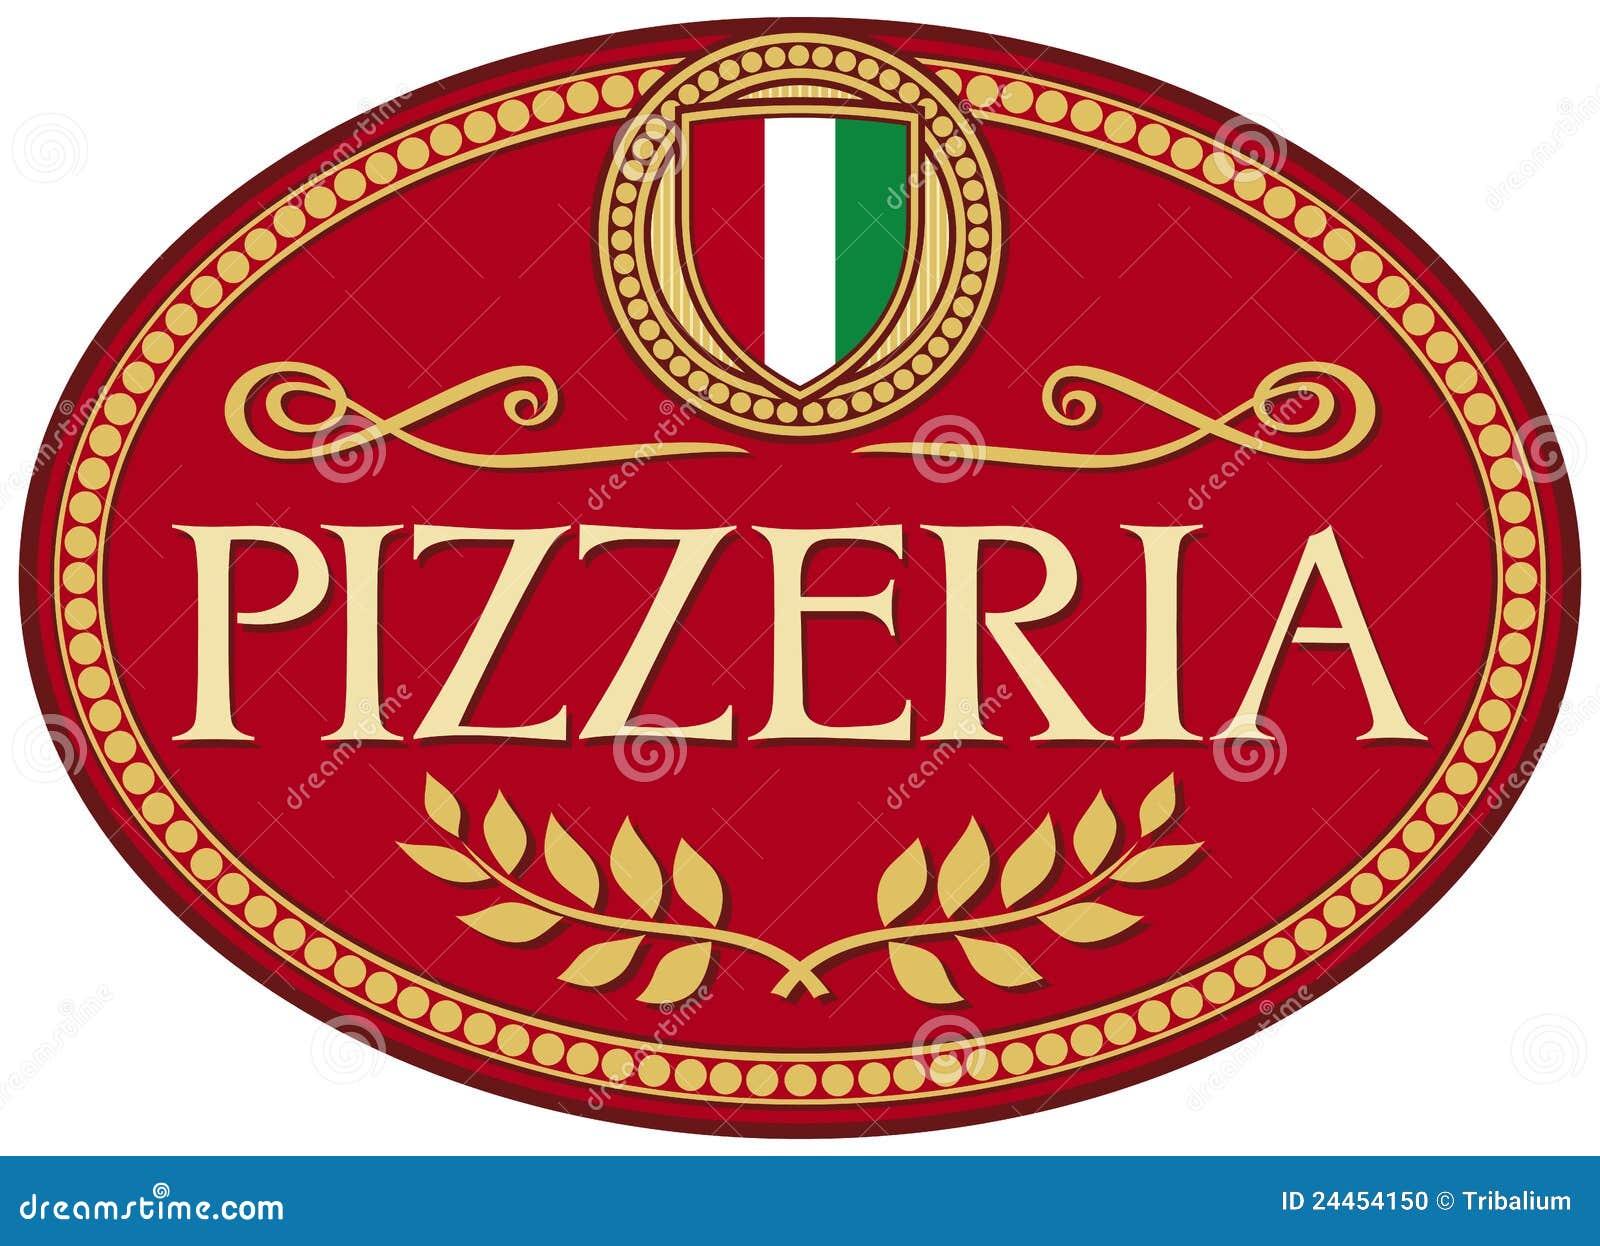 Pizzeria label design stock vector illustration of for Pizza pizzeria